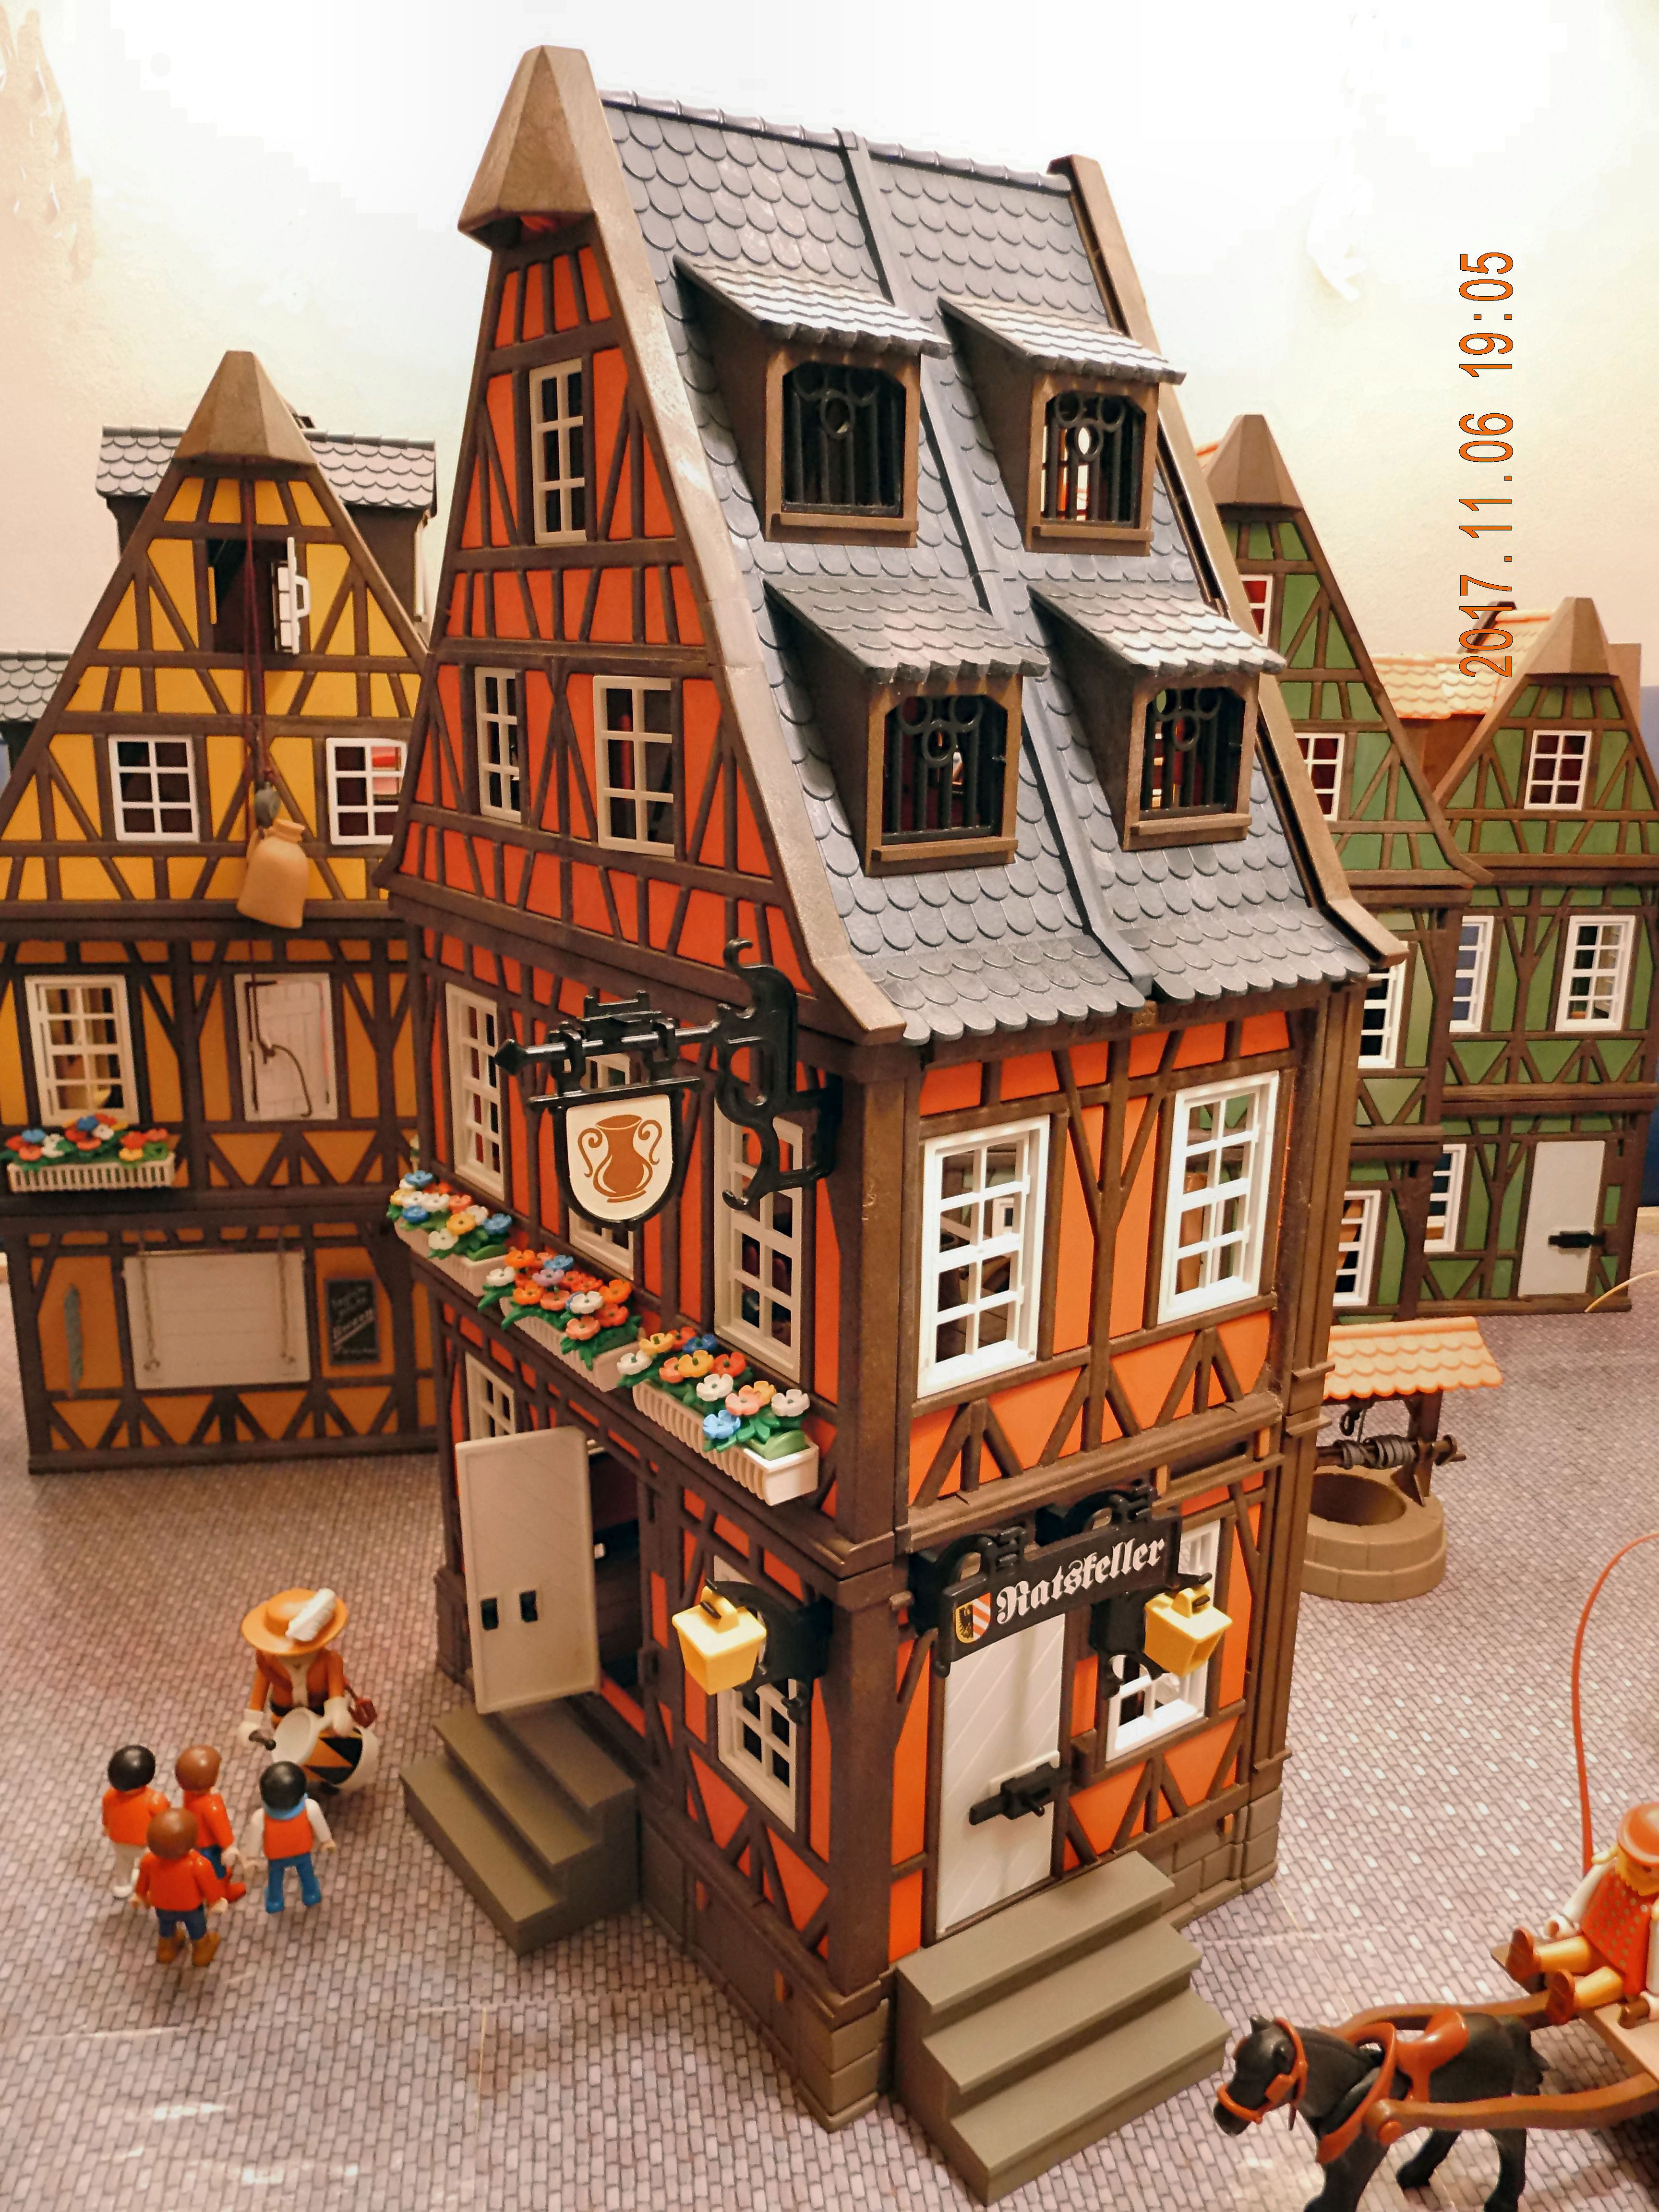 casa roja de playmobil cuatruple maison de poupee maison bois playmobil